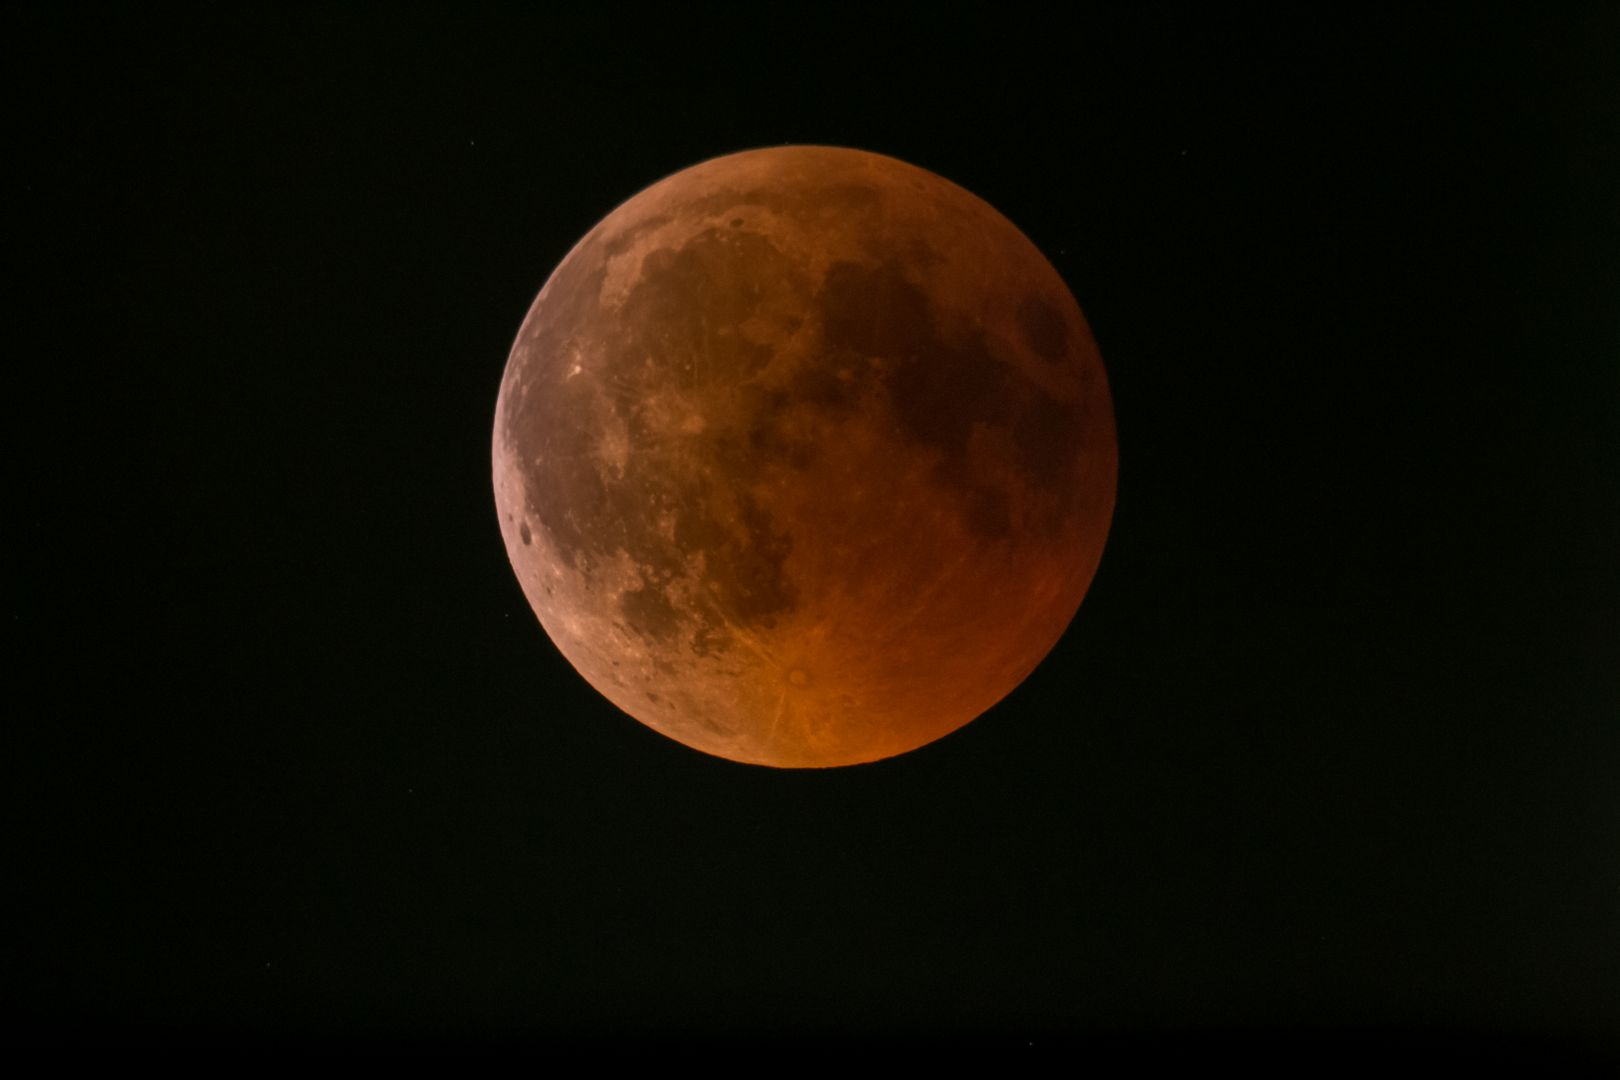 Mondfinsternis am 27.07.2018